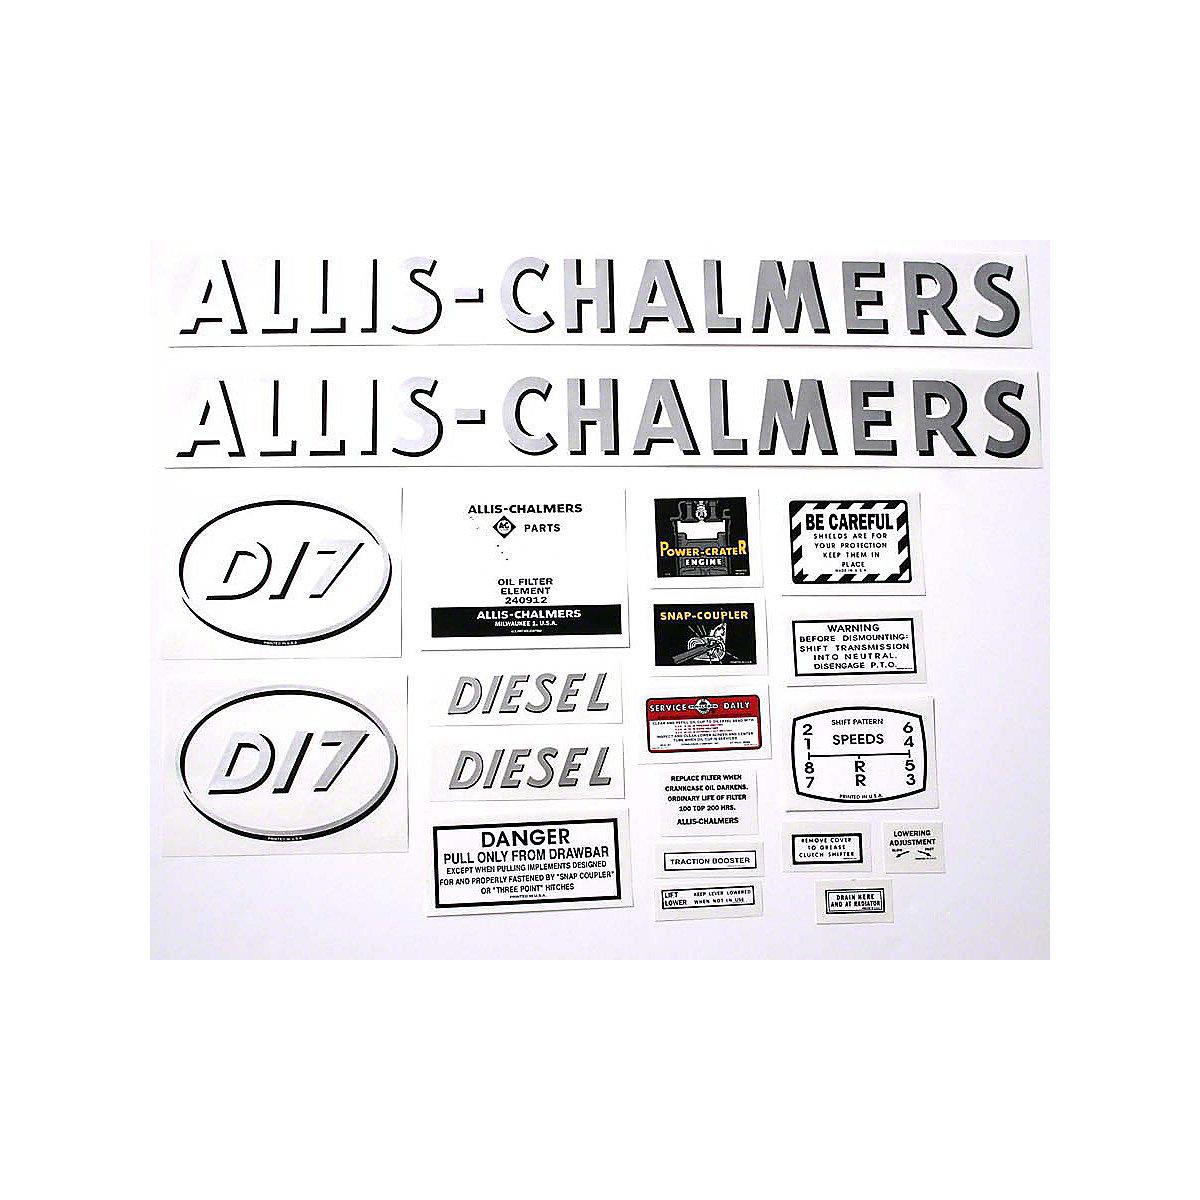 Decal Set For Allis Chalmers D17 Diesel